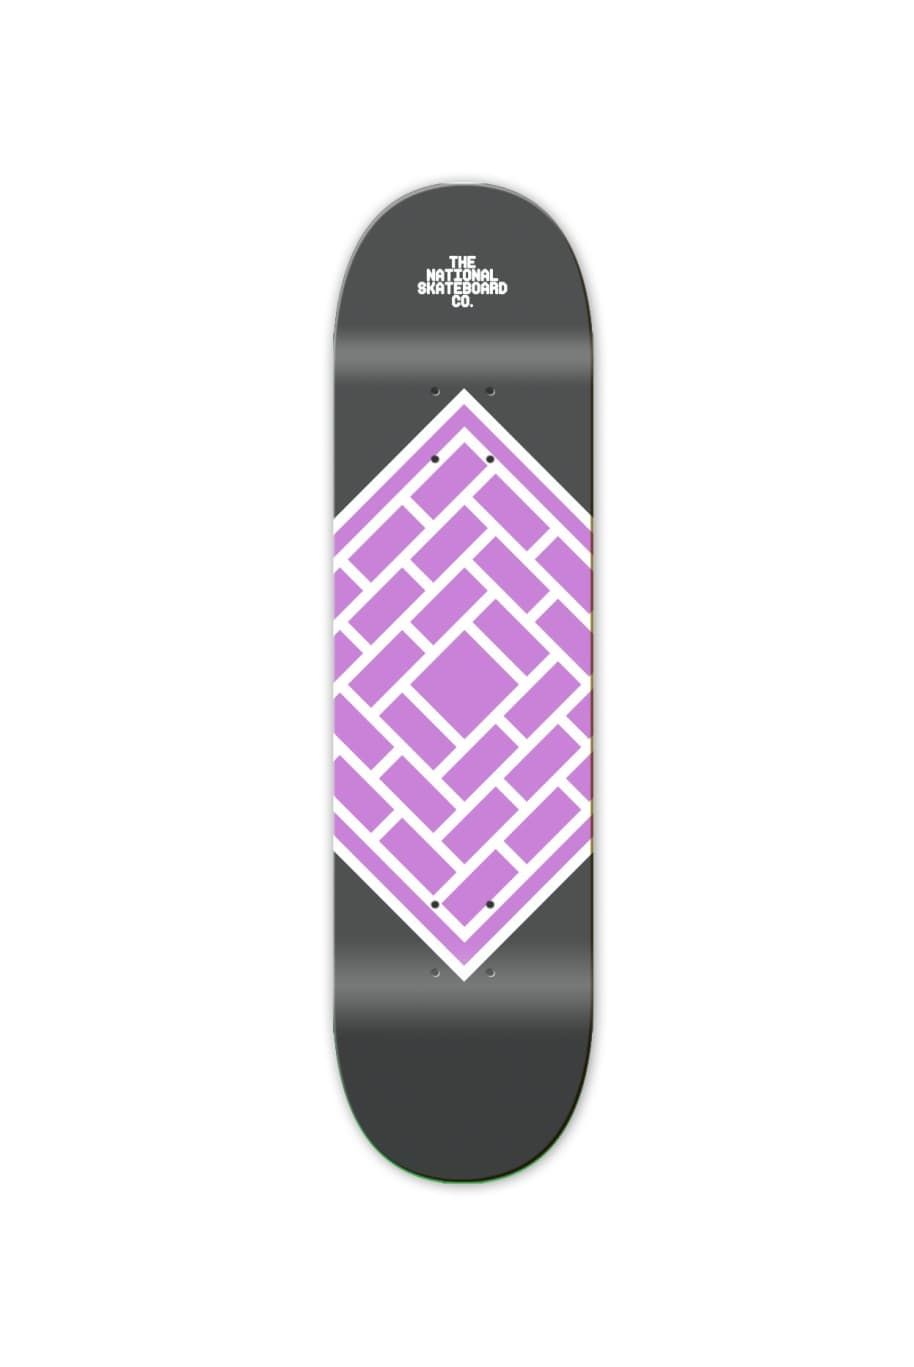 "The National Skateboard Co. Classic Purple Skateboard Deck - 7.5"" | Deck by The National Skateboard Co. 1"